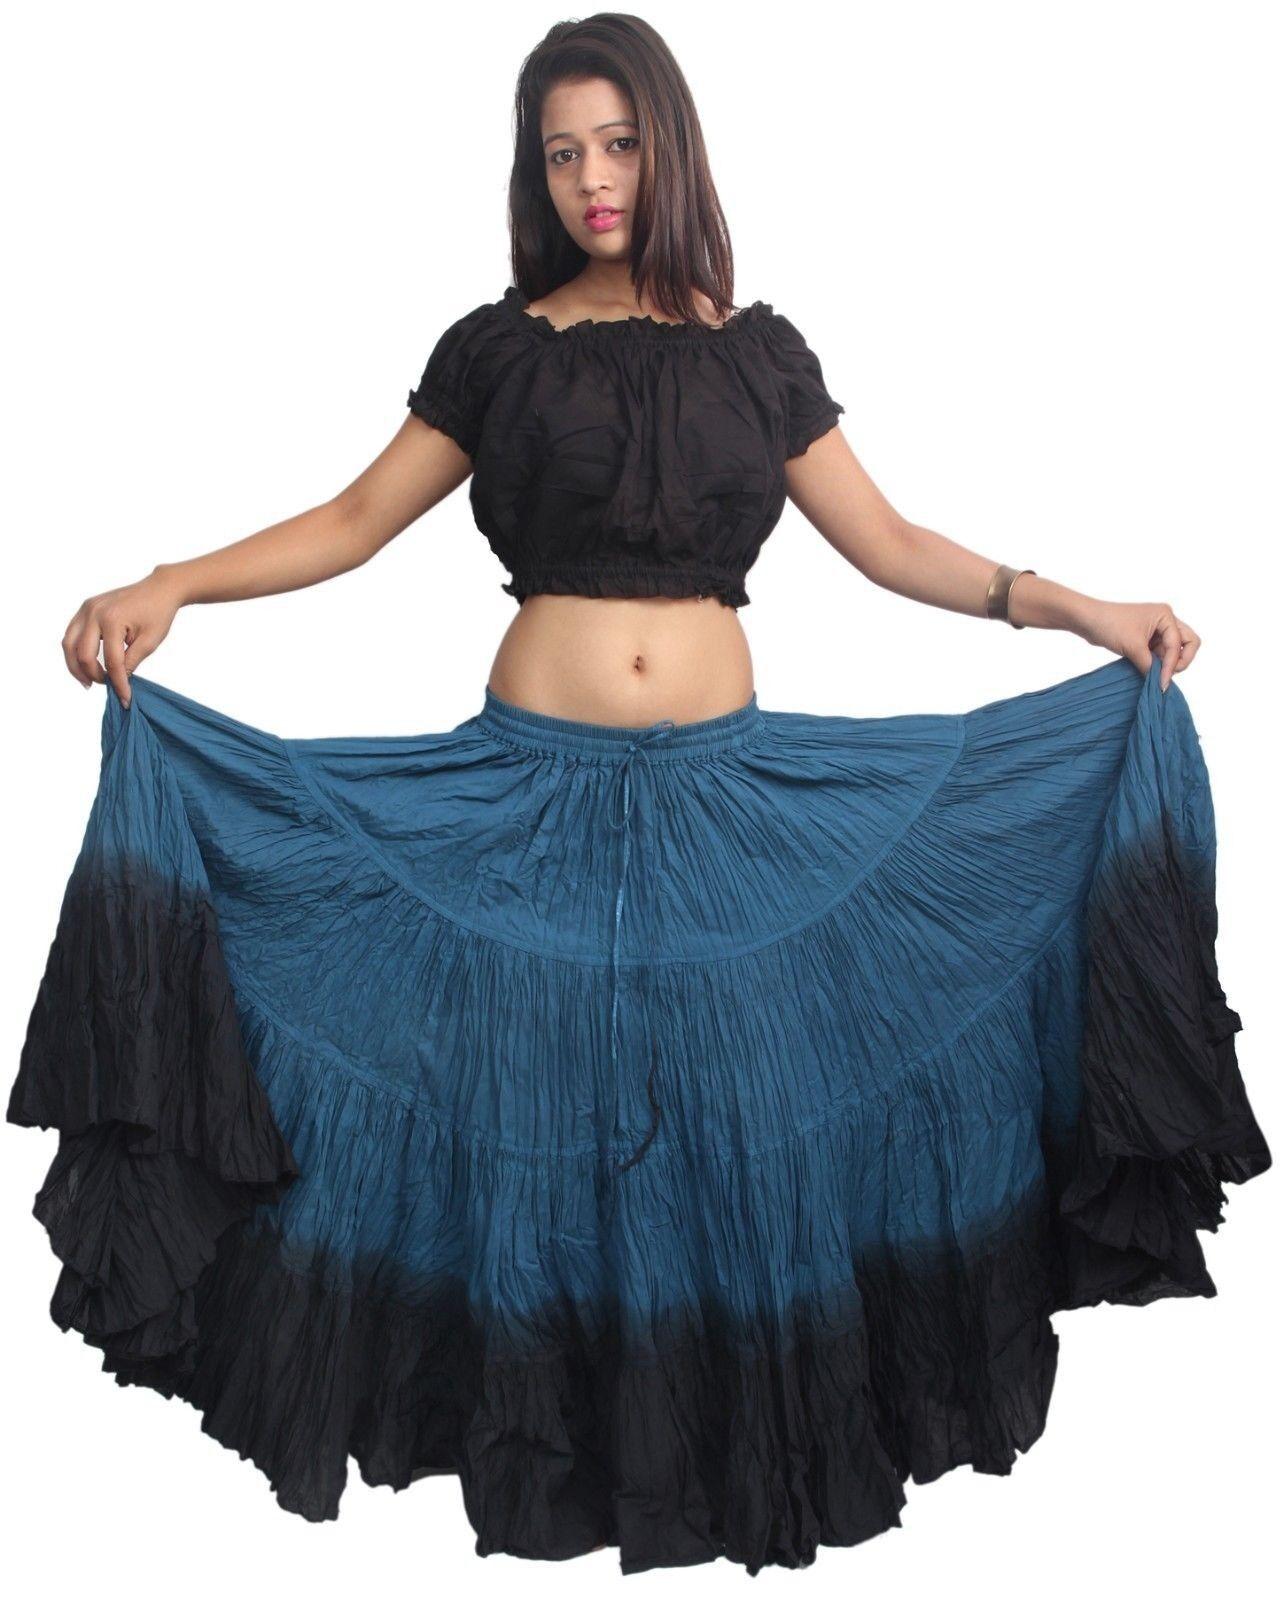 Sariskirt 25 Yard Cotton Gypsy Tribal Dance Skirt Dual color